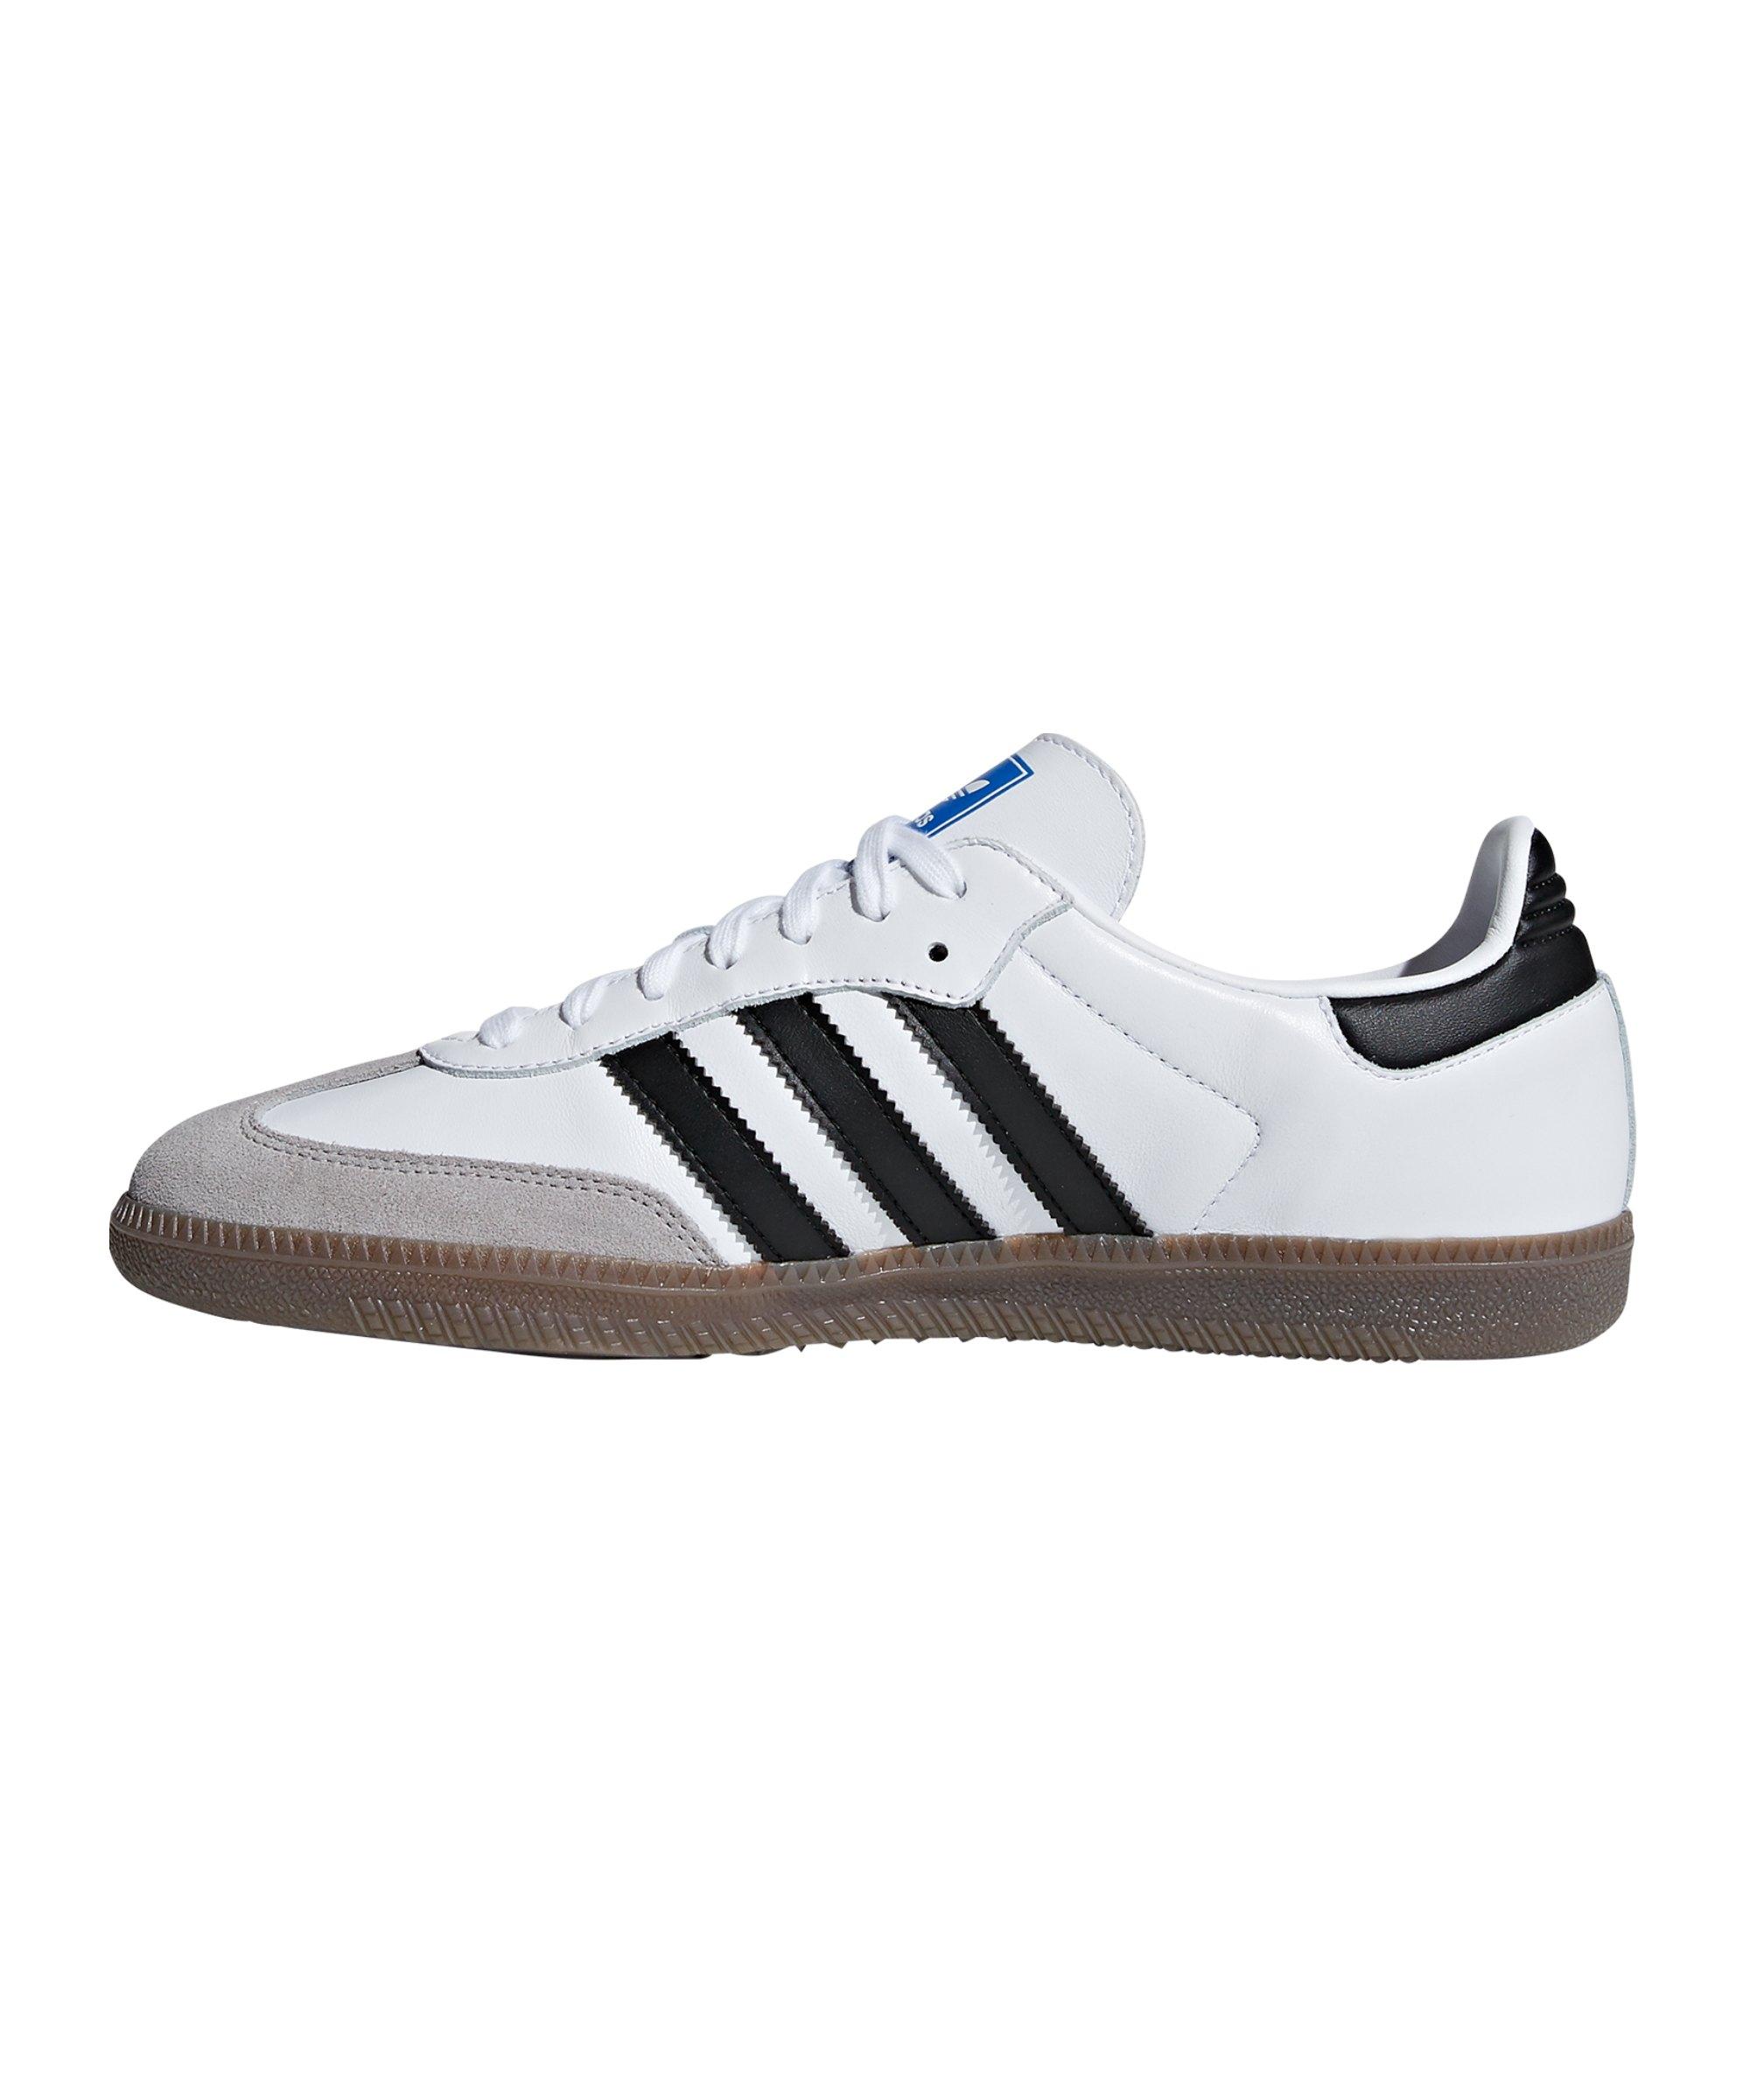 D9398 Adidas Weiß Samba Coupon 5c808 Originals ikXuPZ